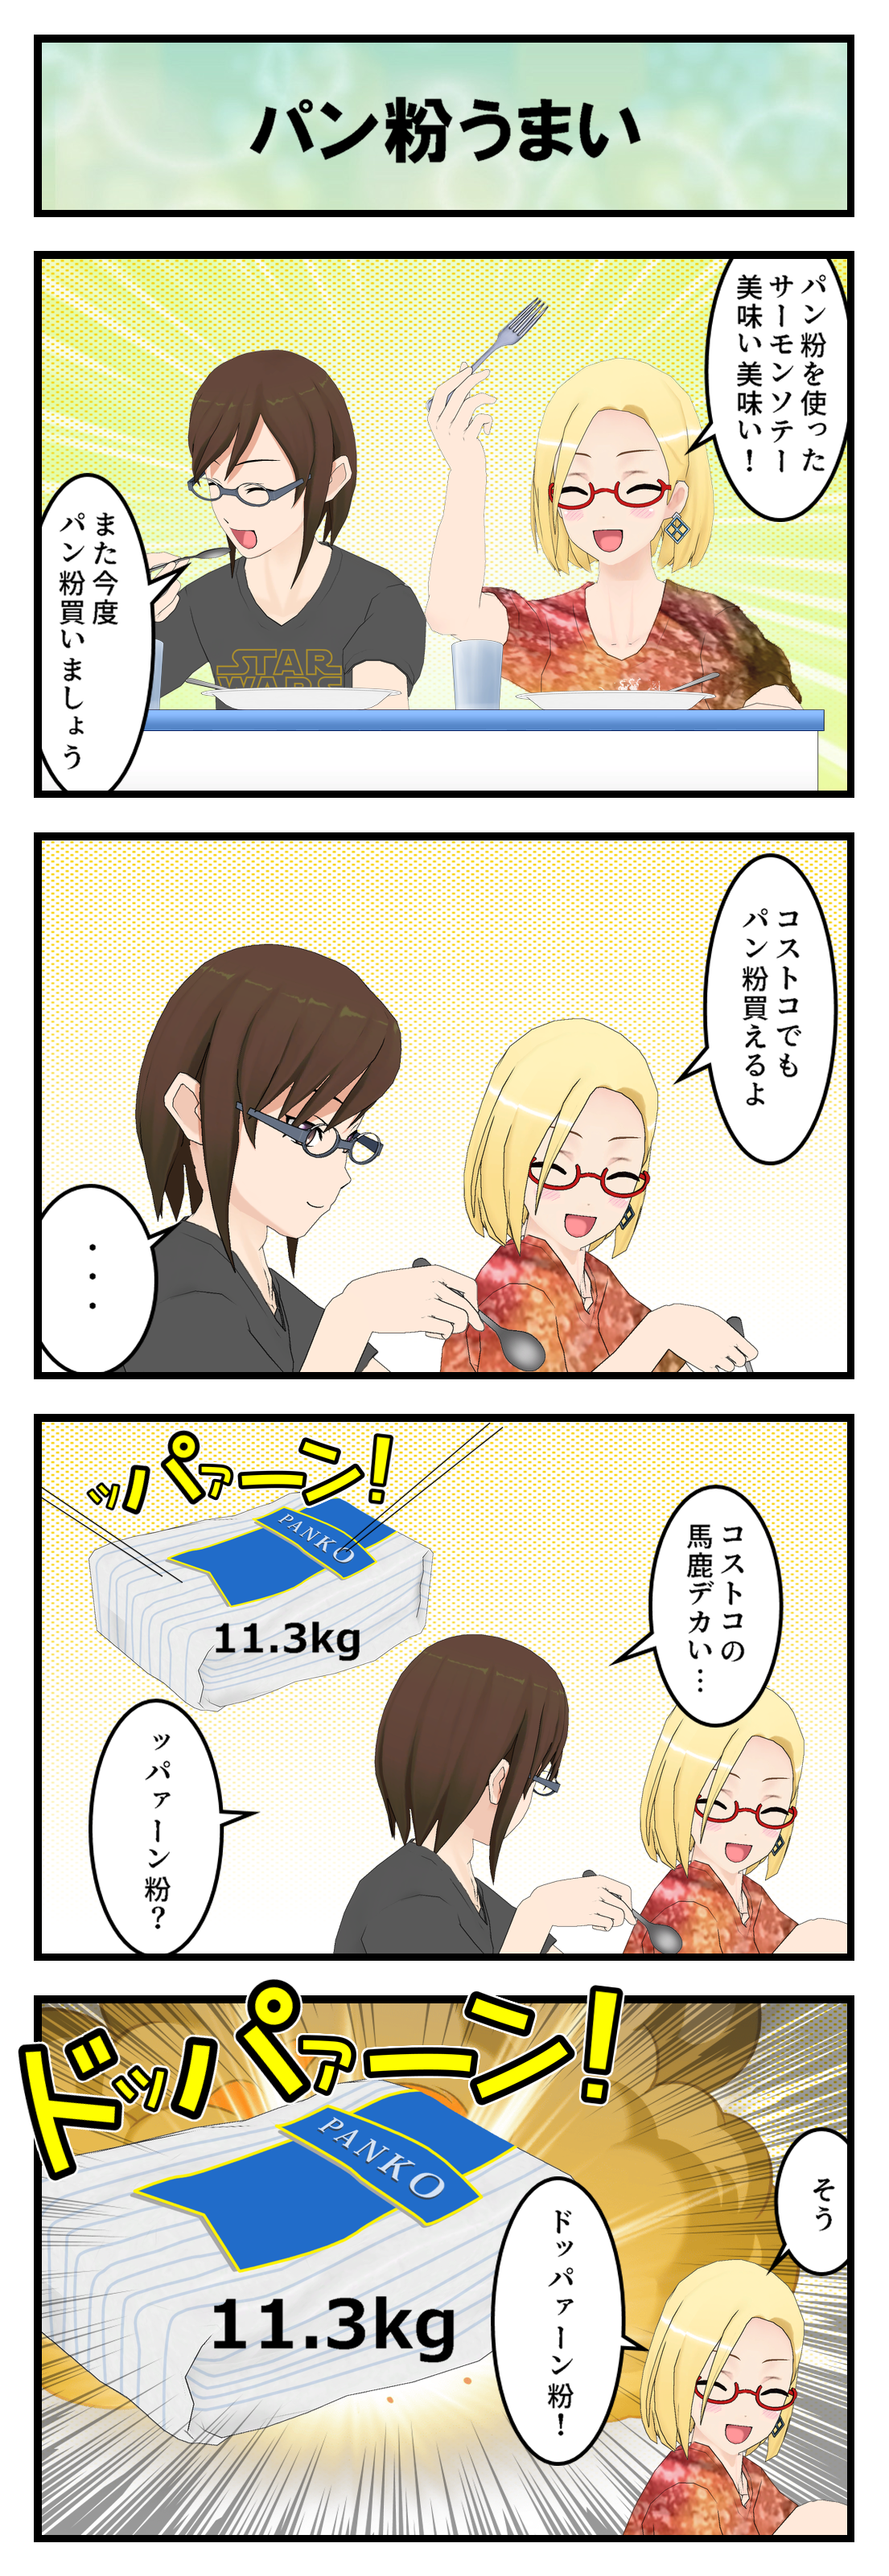 R154_ドパン粉_001